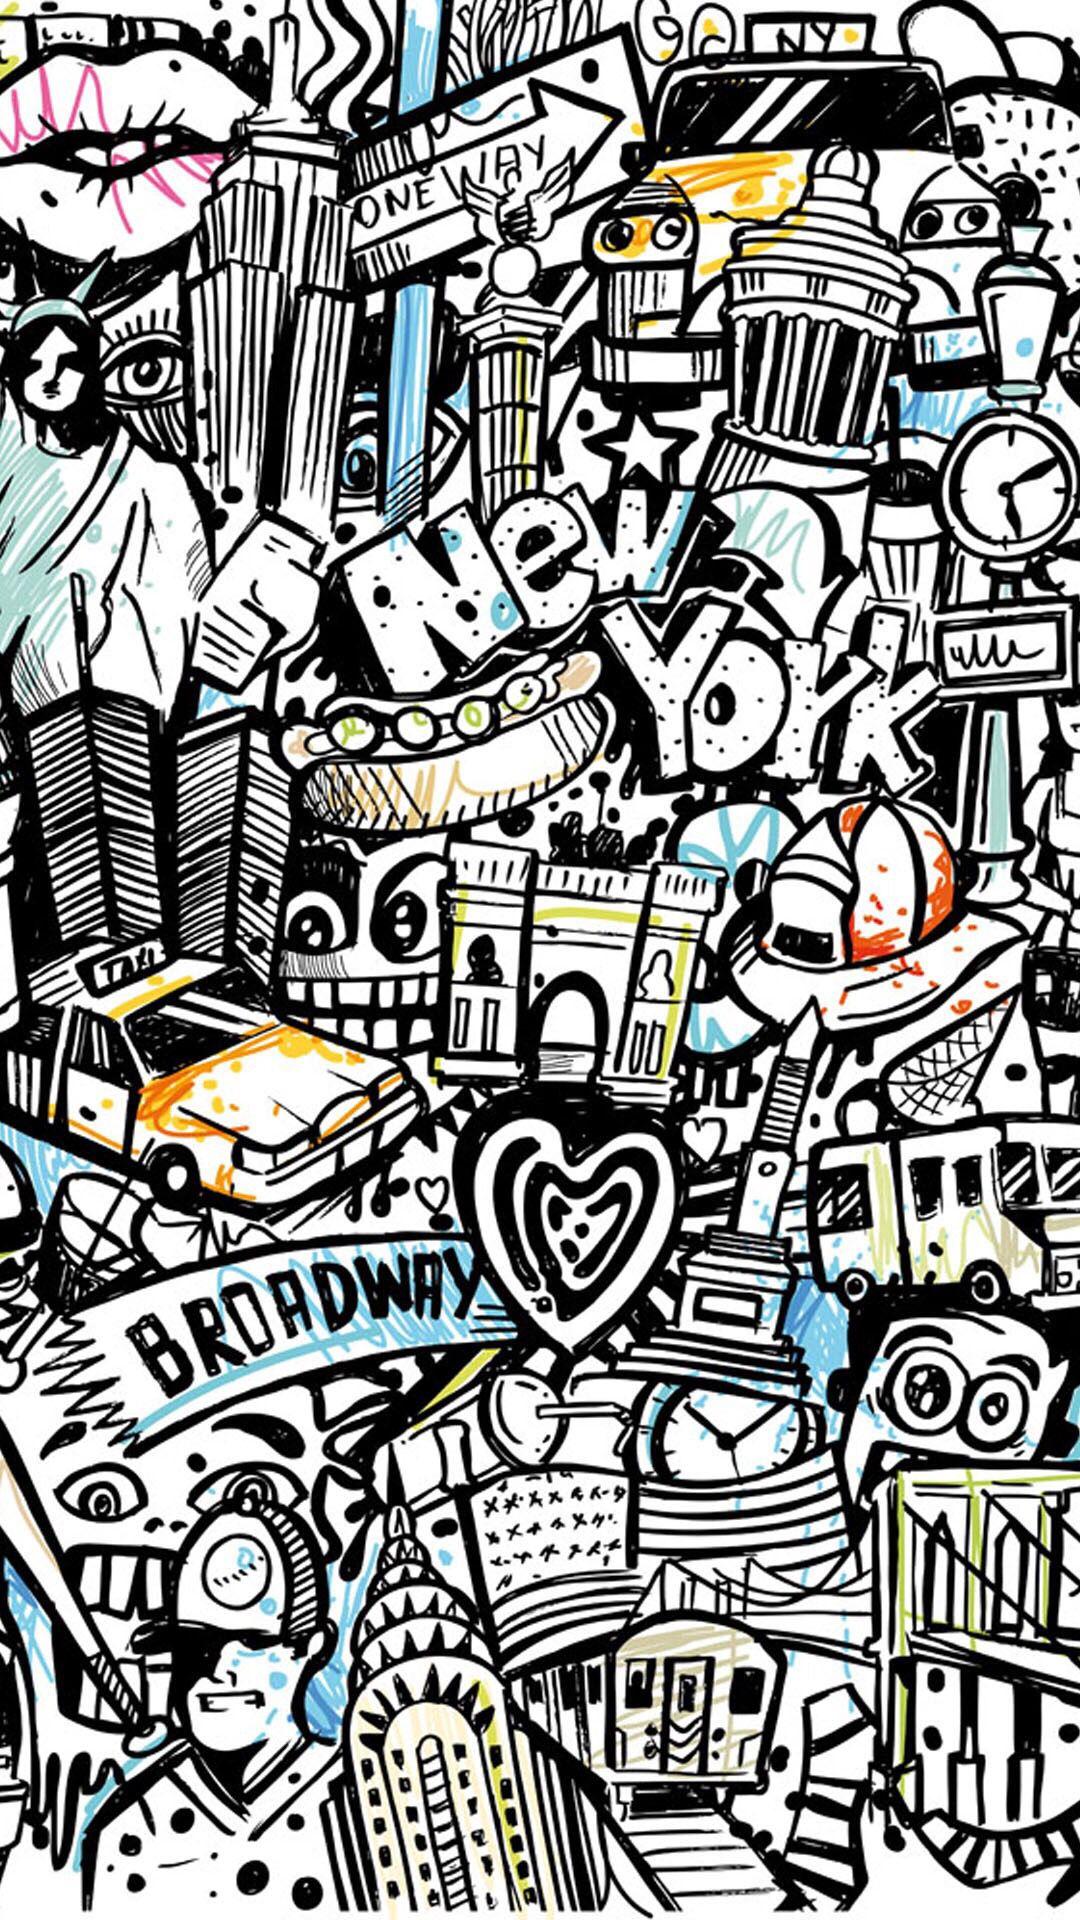 Graffiti More グラフィティ ストリートアート